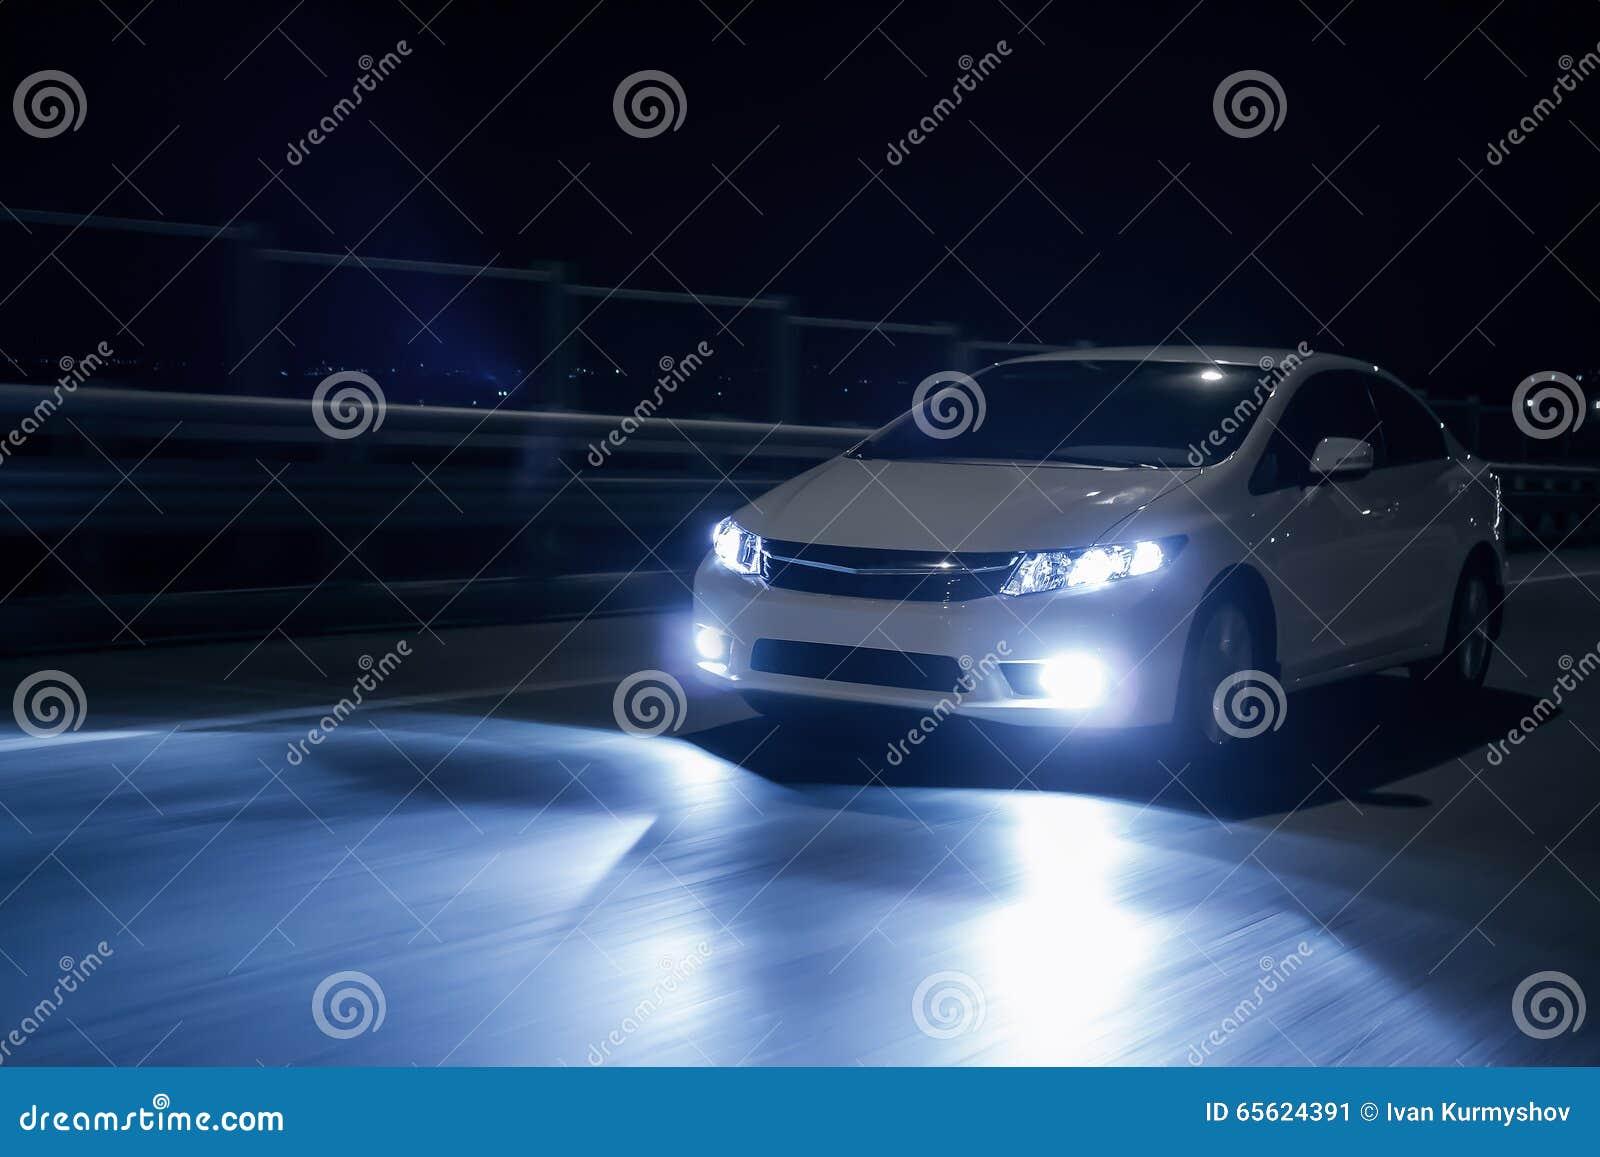 fast car on road cartoon vector 7467423. Black Bedroom Furniture Sets. Home Design Ideas